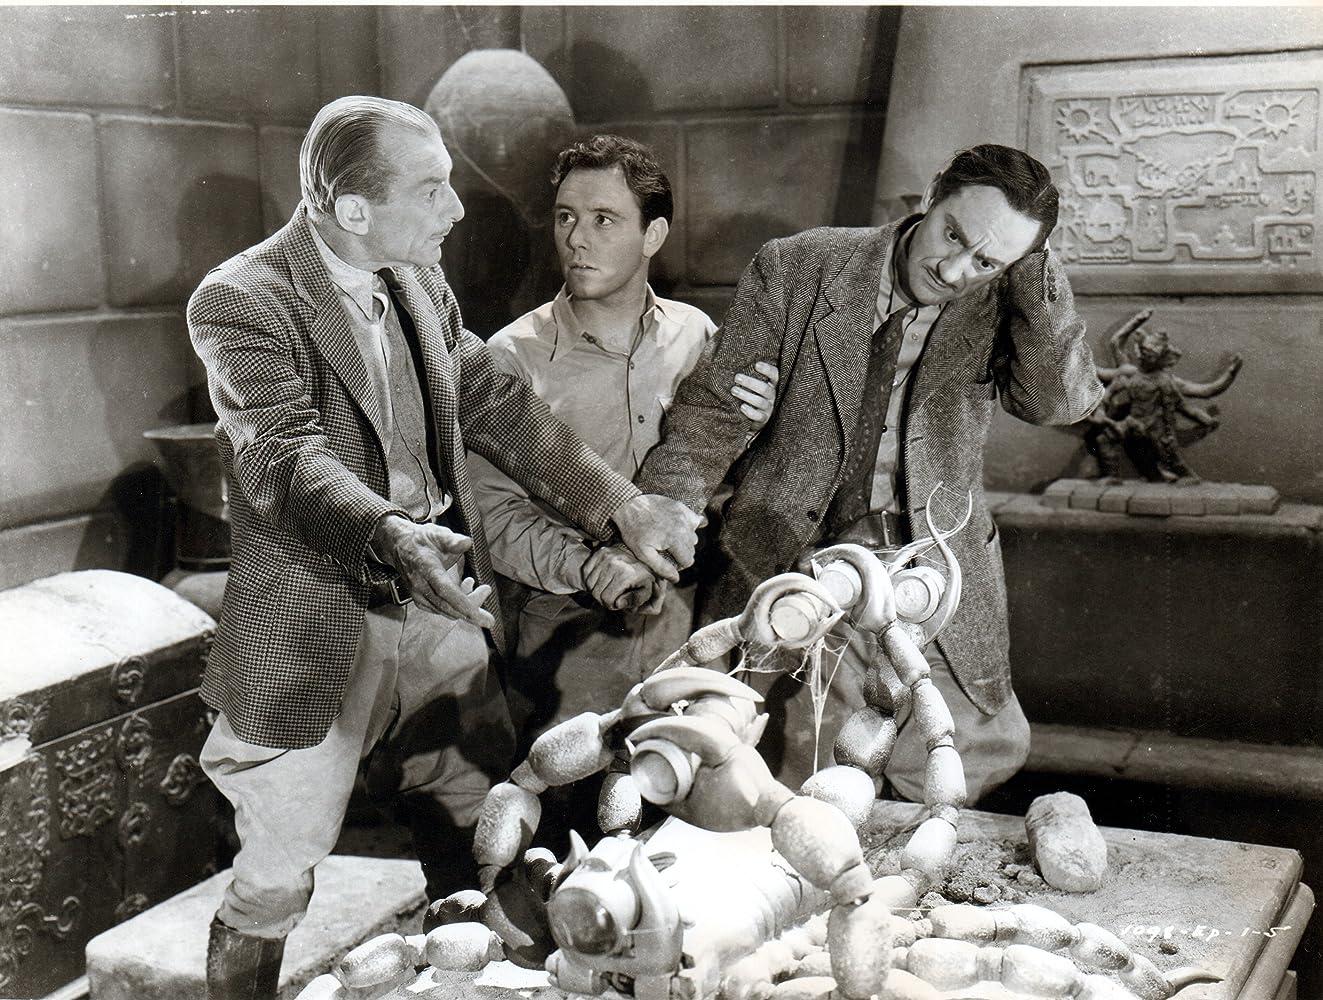 Frank Coghlan Jr., Robert Strange, and Harry Worth in Adventures of Captain Marvel (1941)